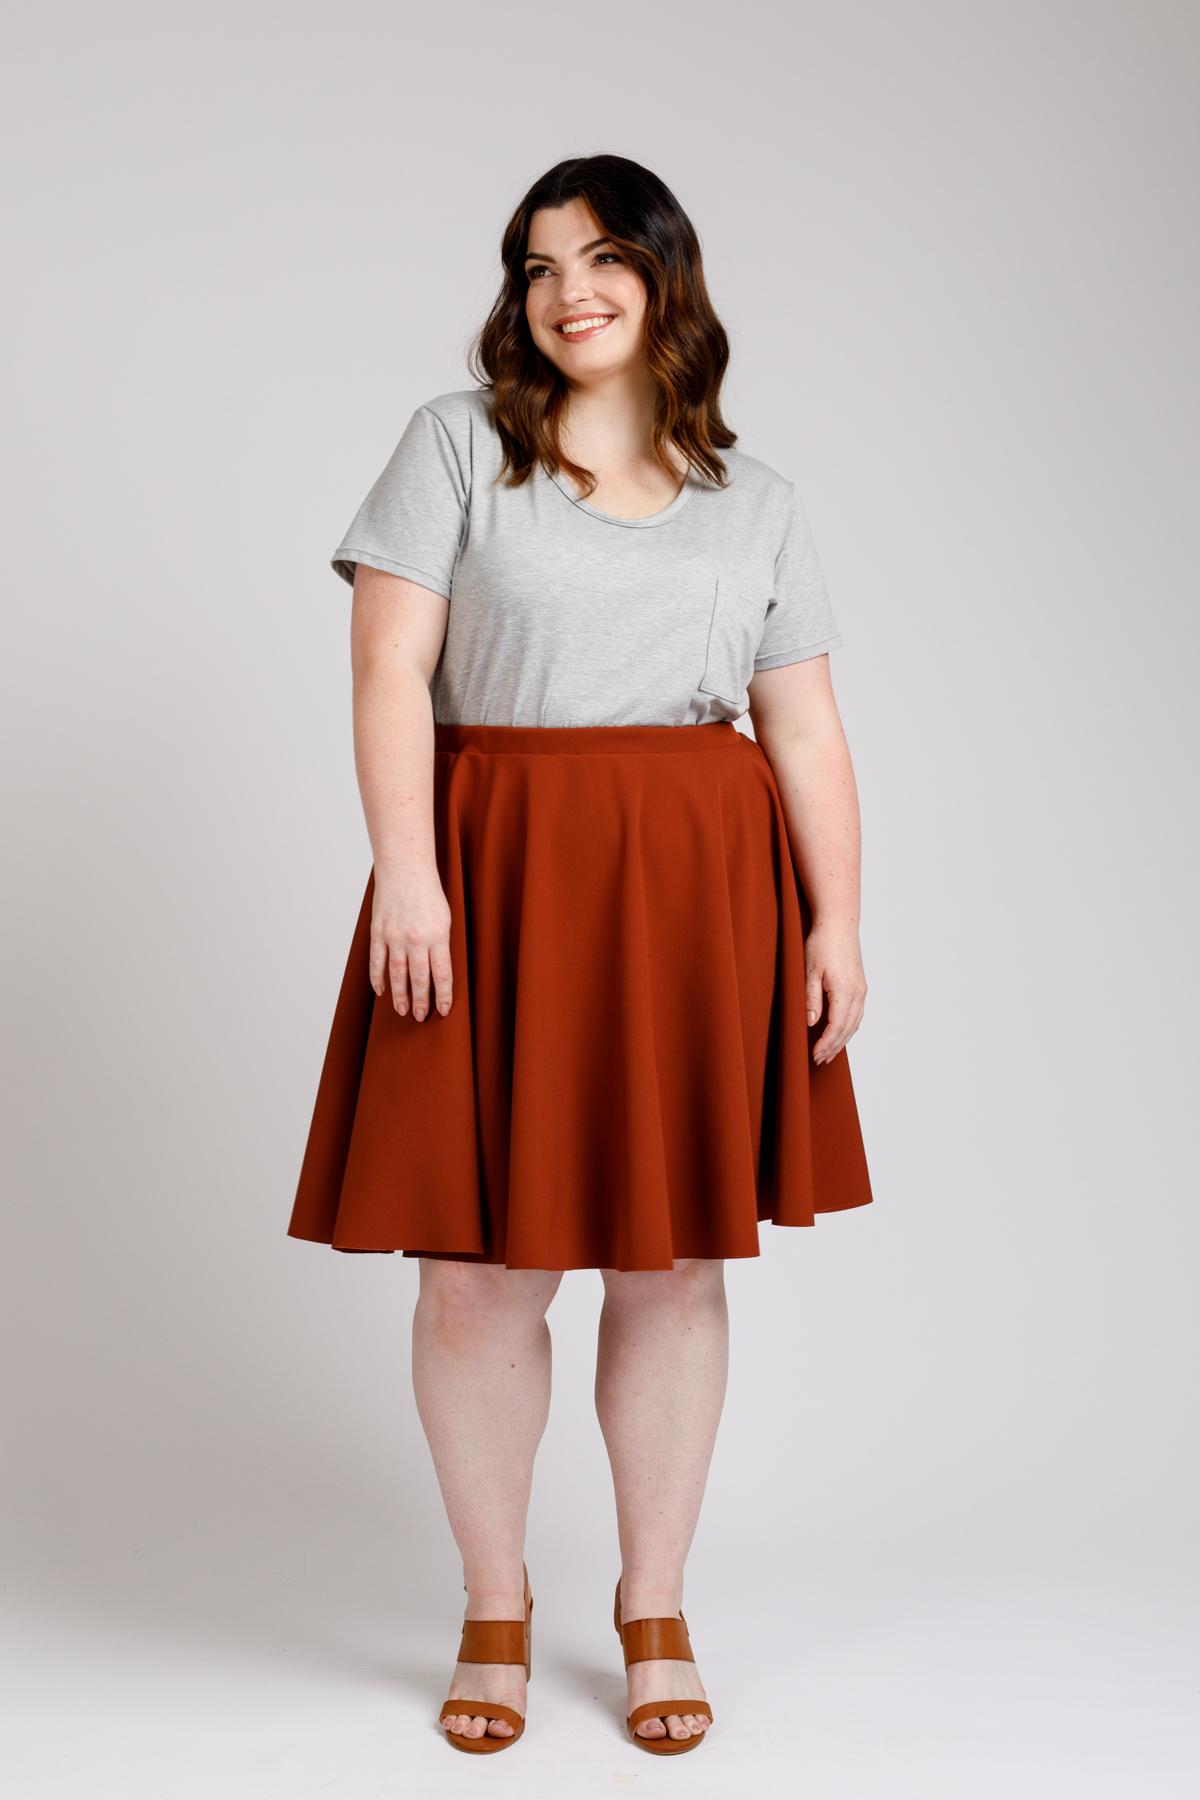 Veronika Curve skirt View C